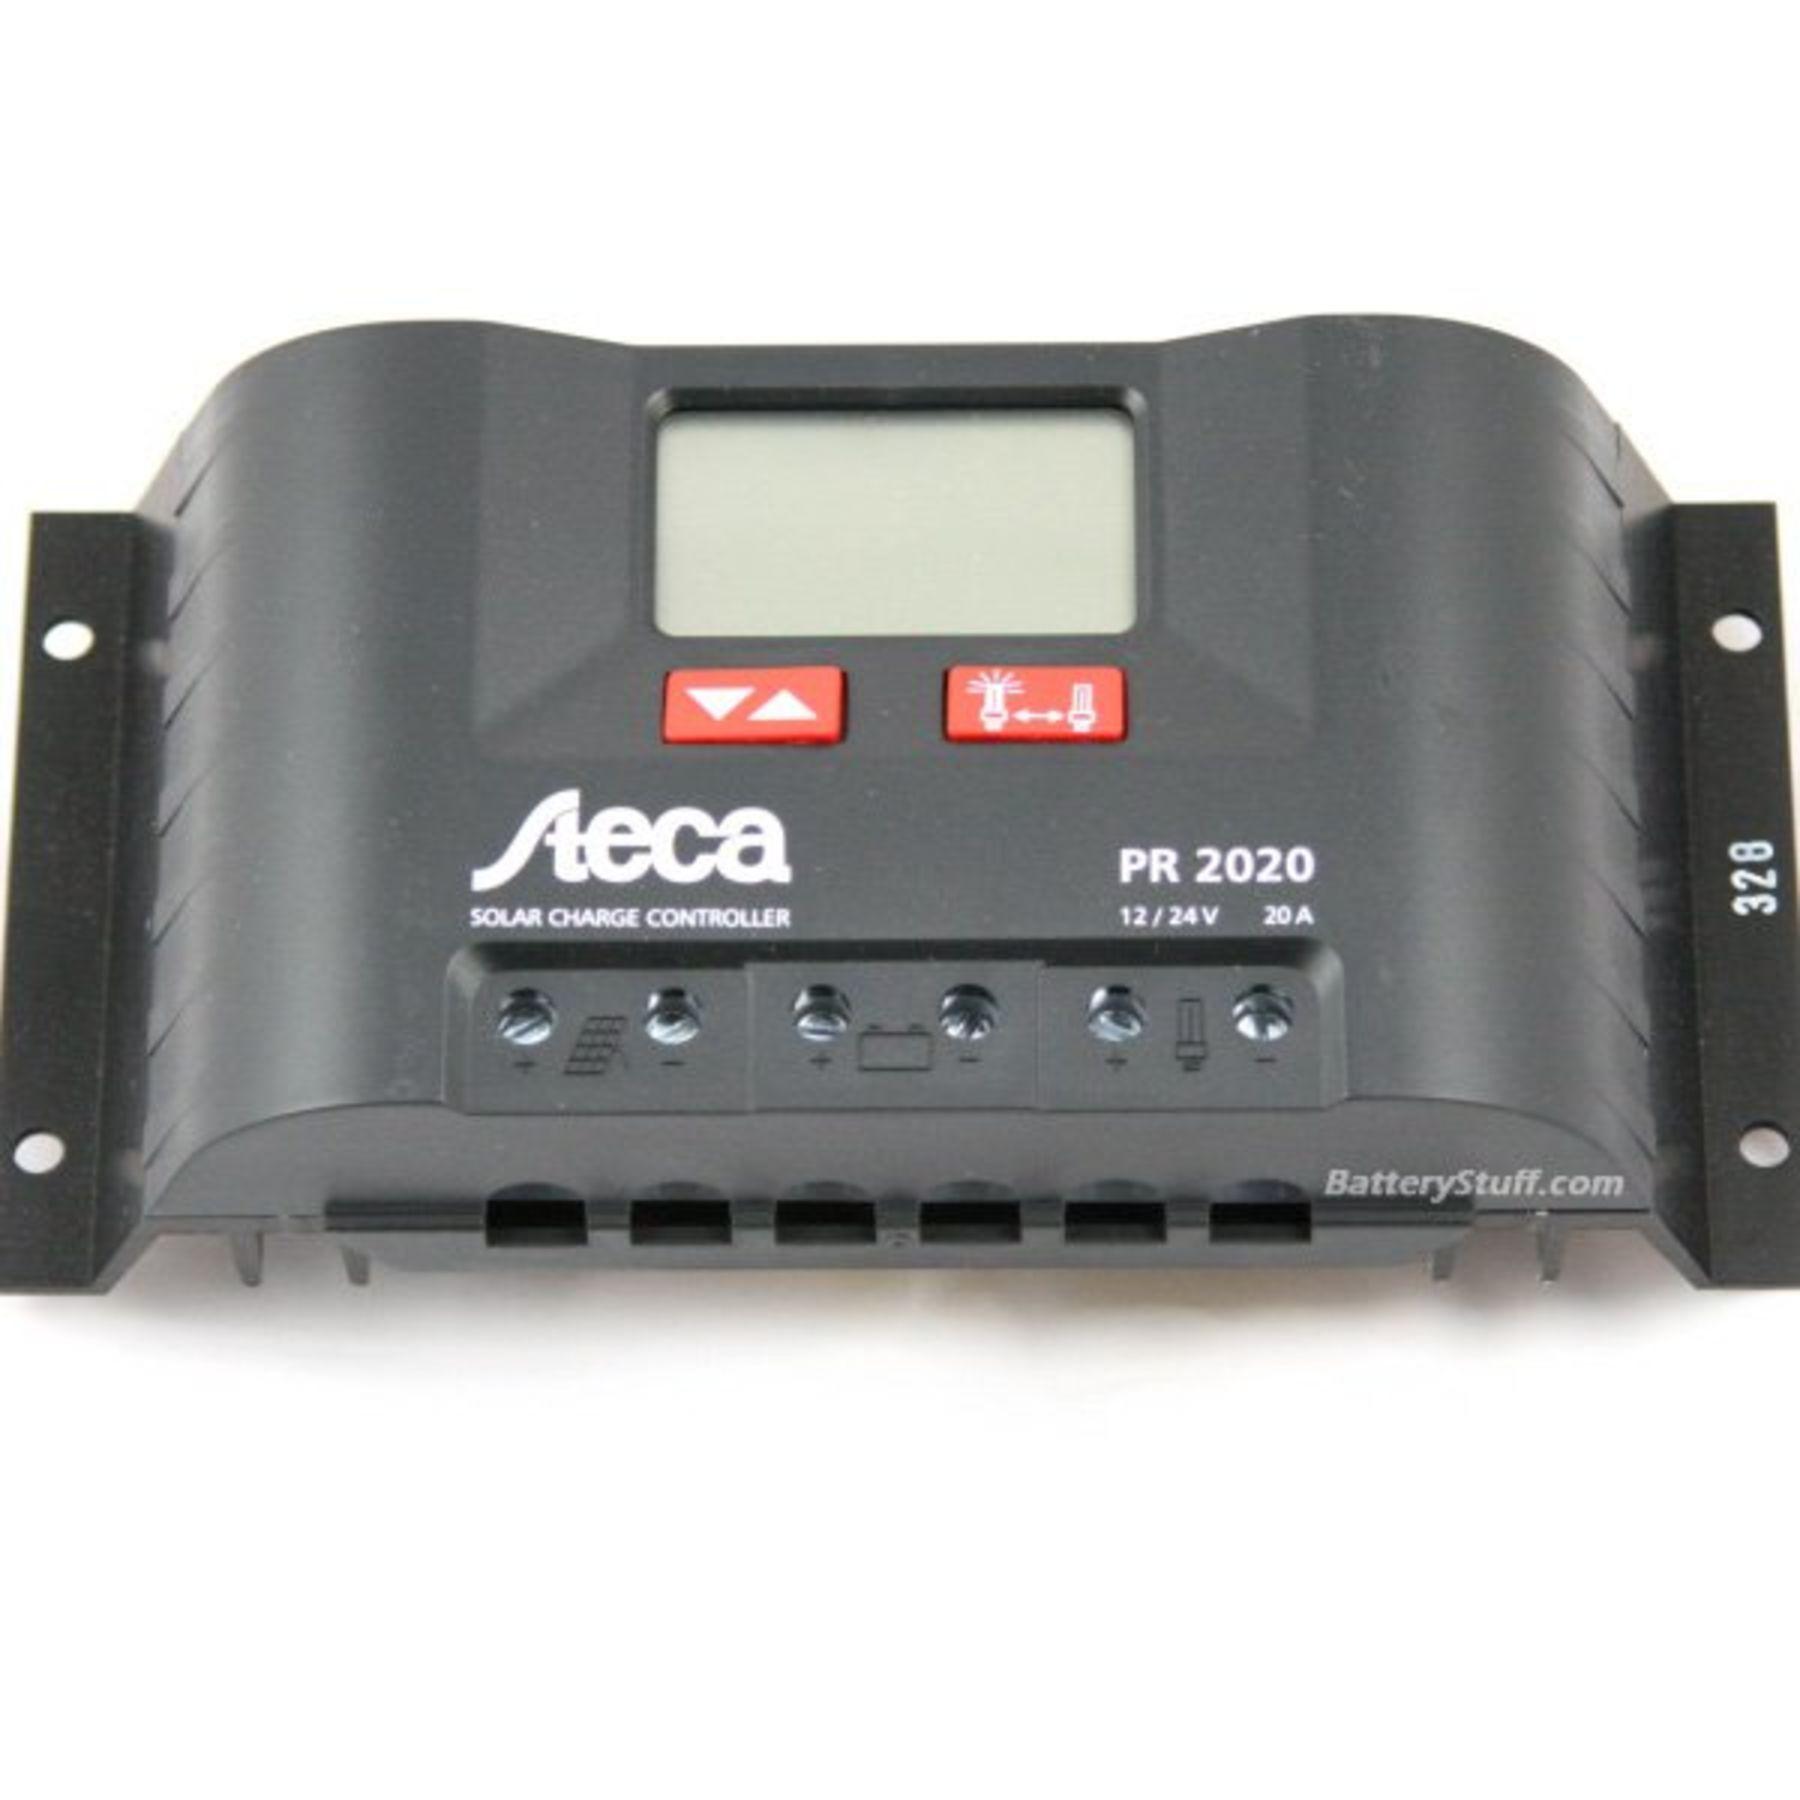 Samlex 12v 24v 20 Amp Steca Solar Charge Controller With Lcd Display Pr2020